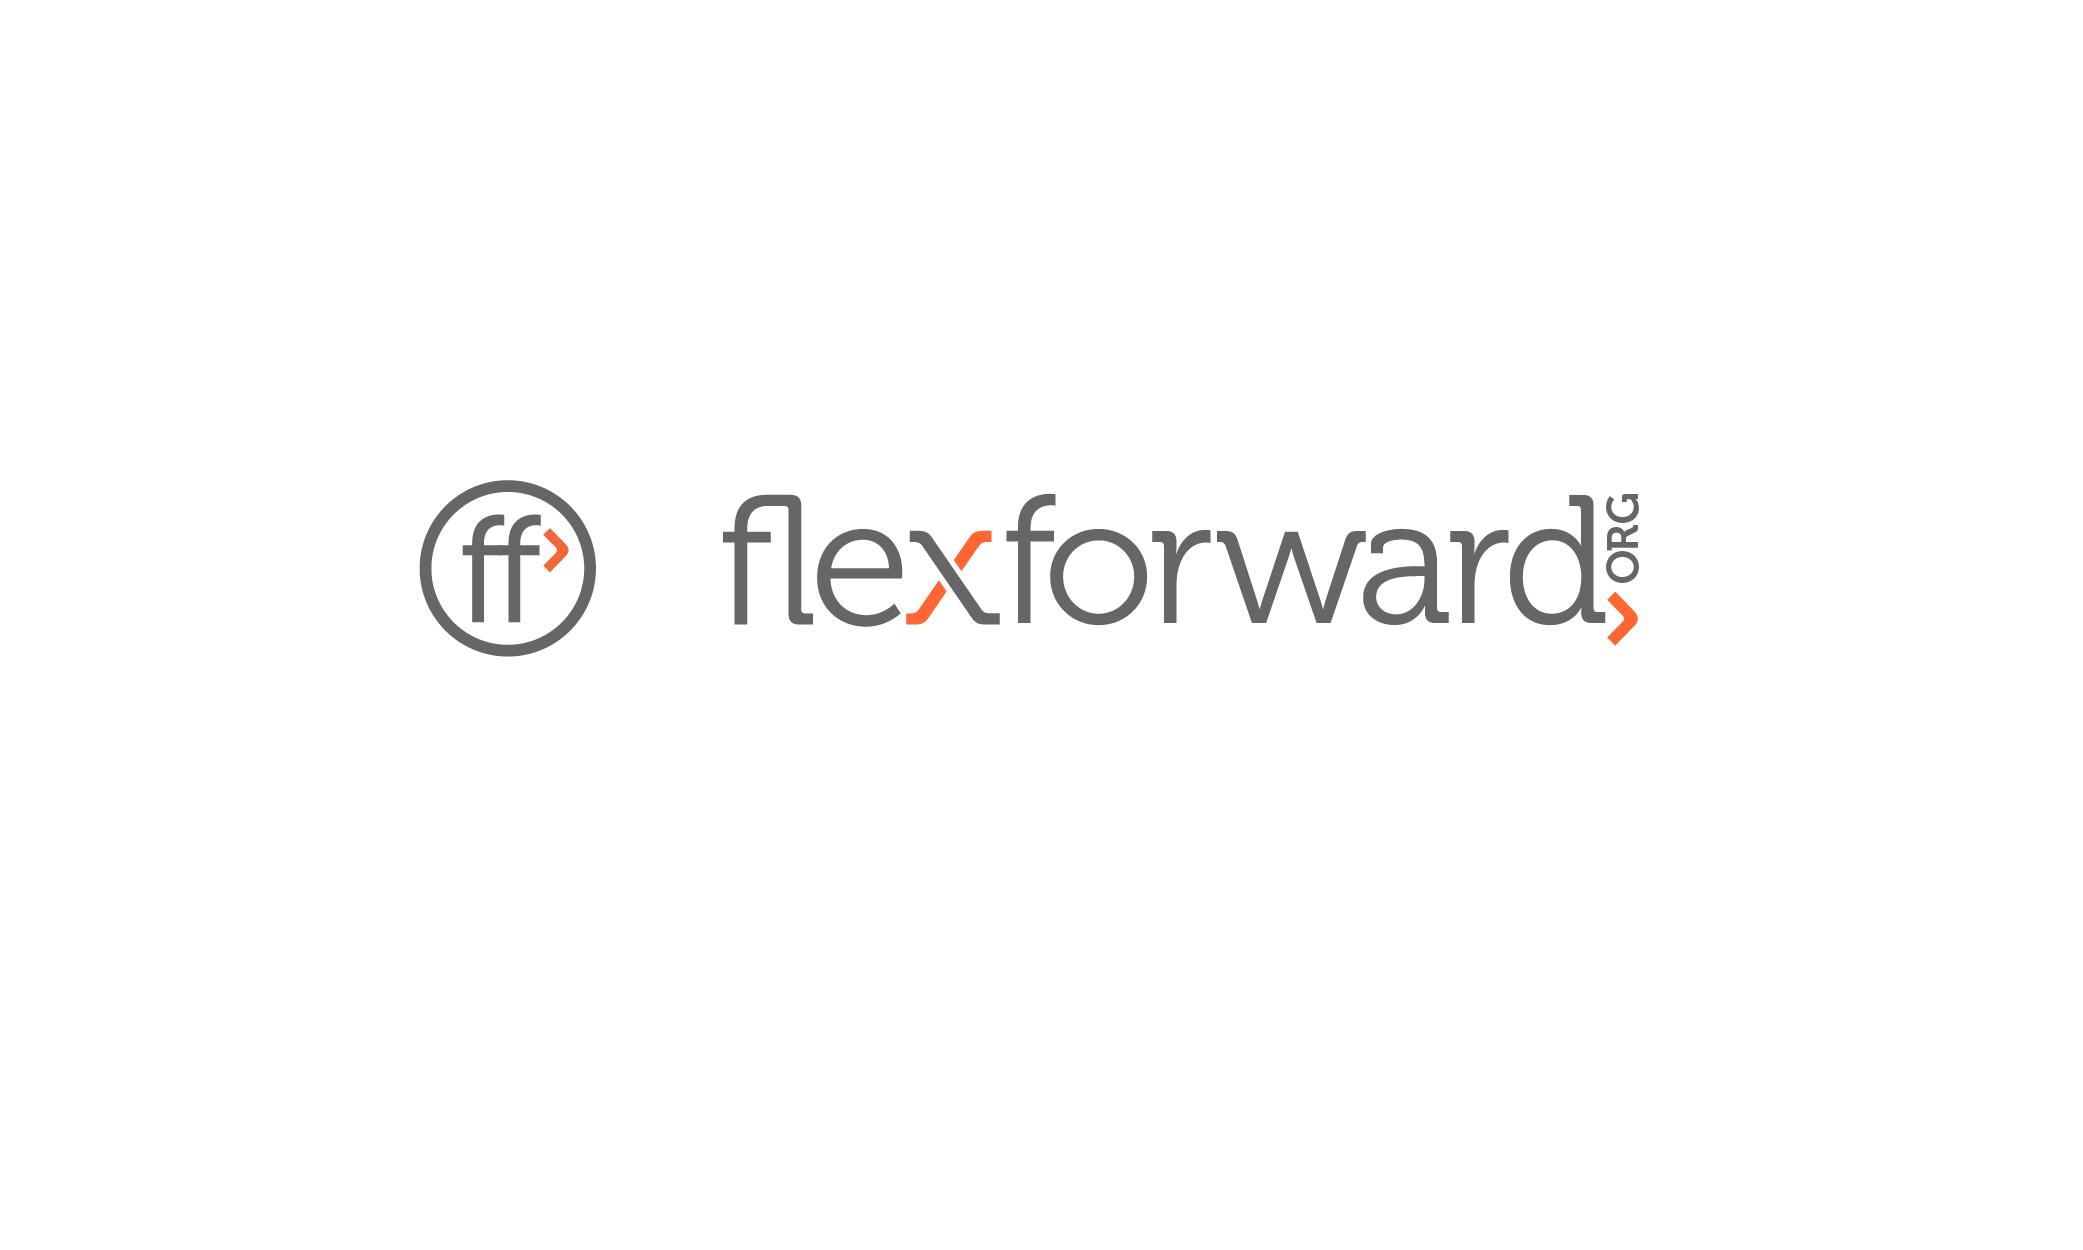 flexff_logo-01.png